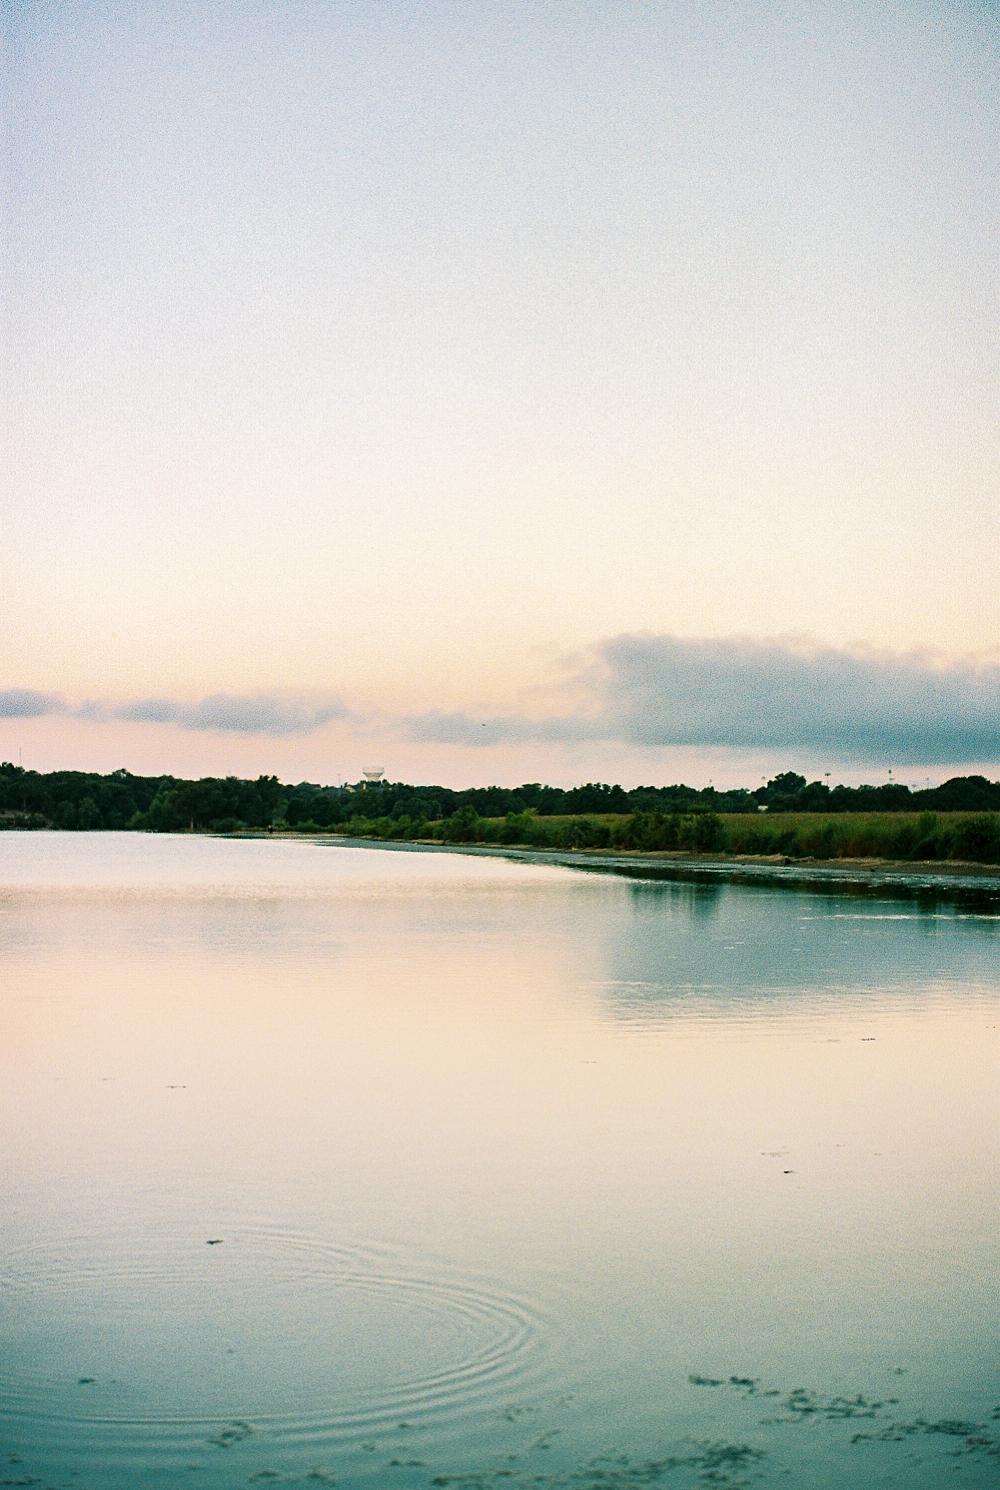 kristin-la-voie-photography-Austin-Texas-Photographer-14